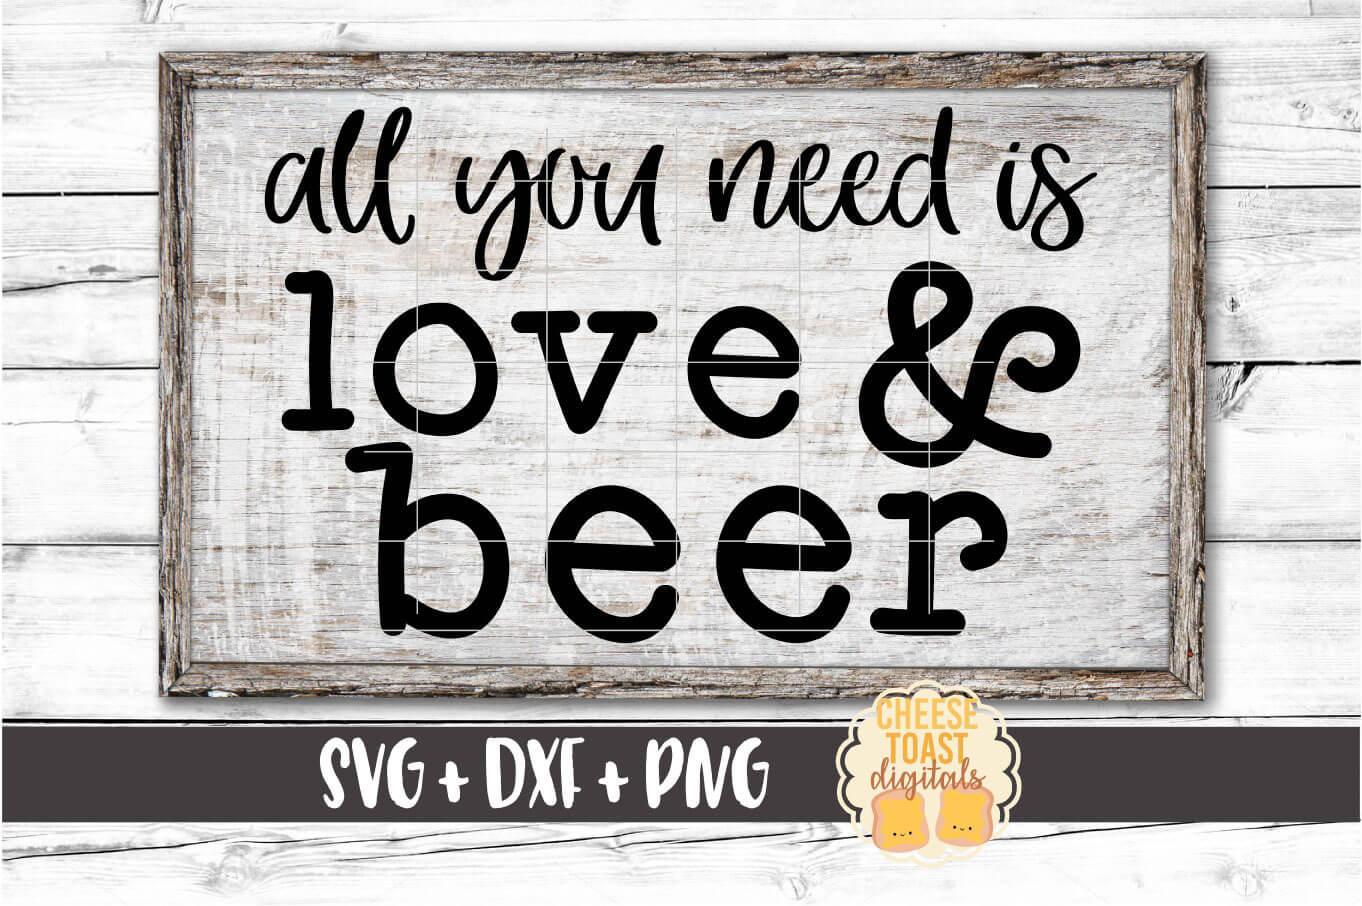 Beer Sign Bundle - 5 Designs SVG PNG DXF Cut Files example image 2